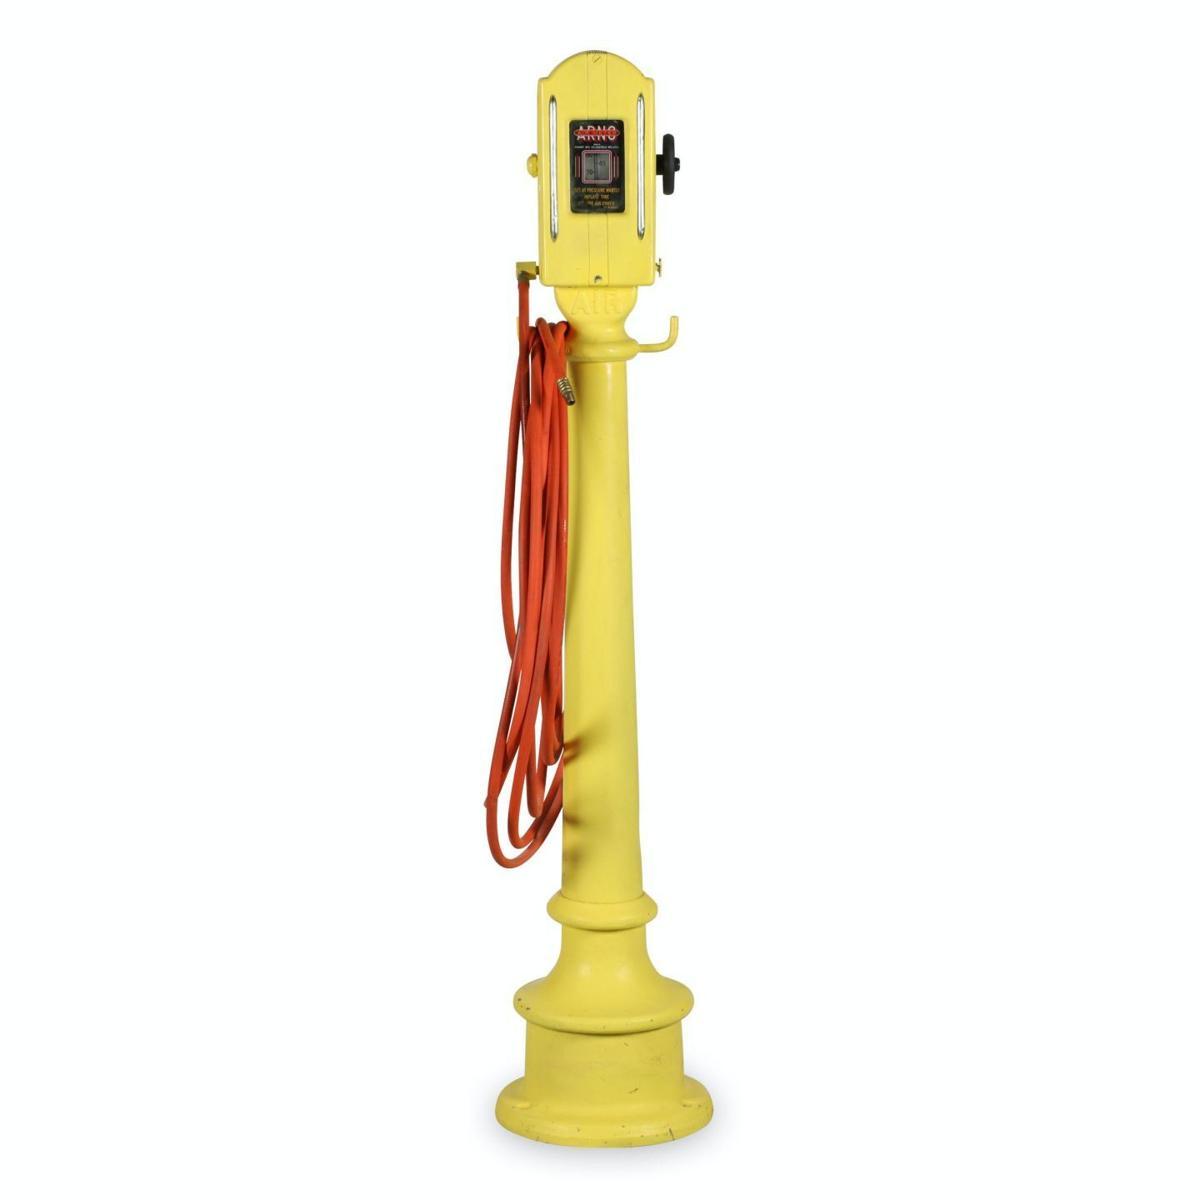 Arno air meter.jpg